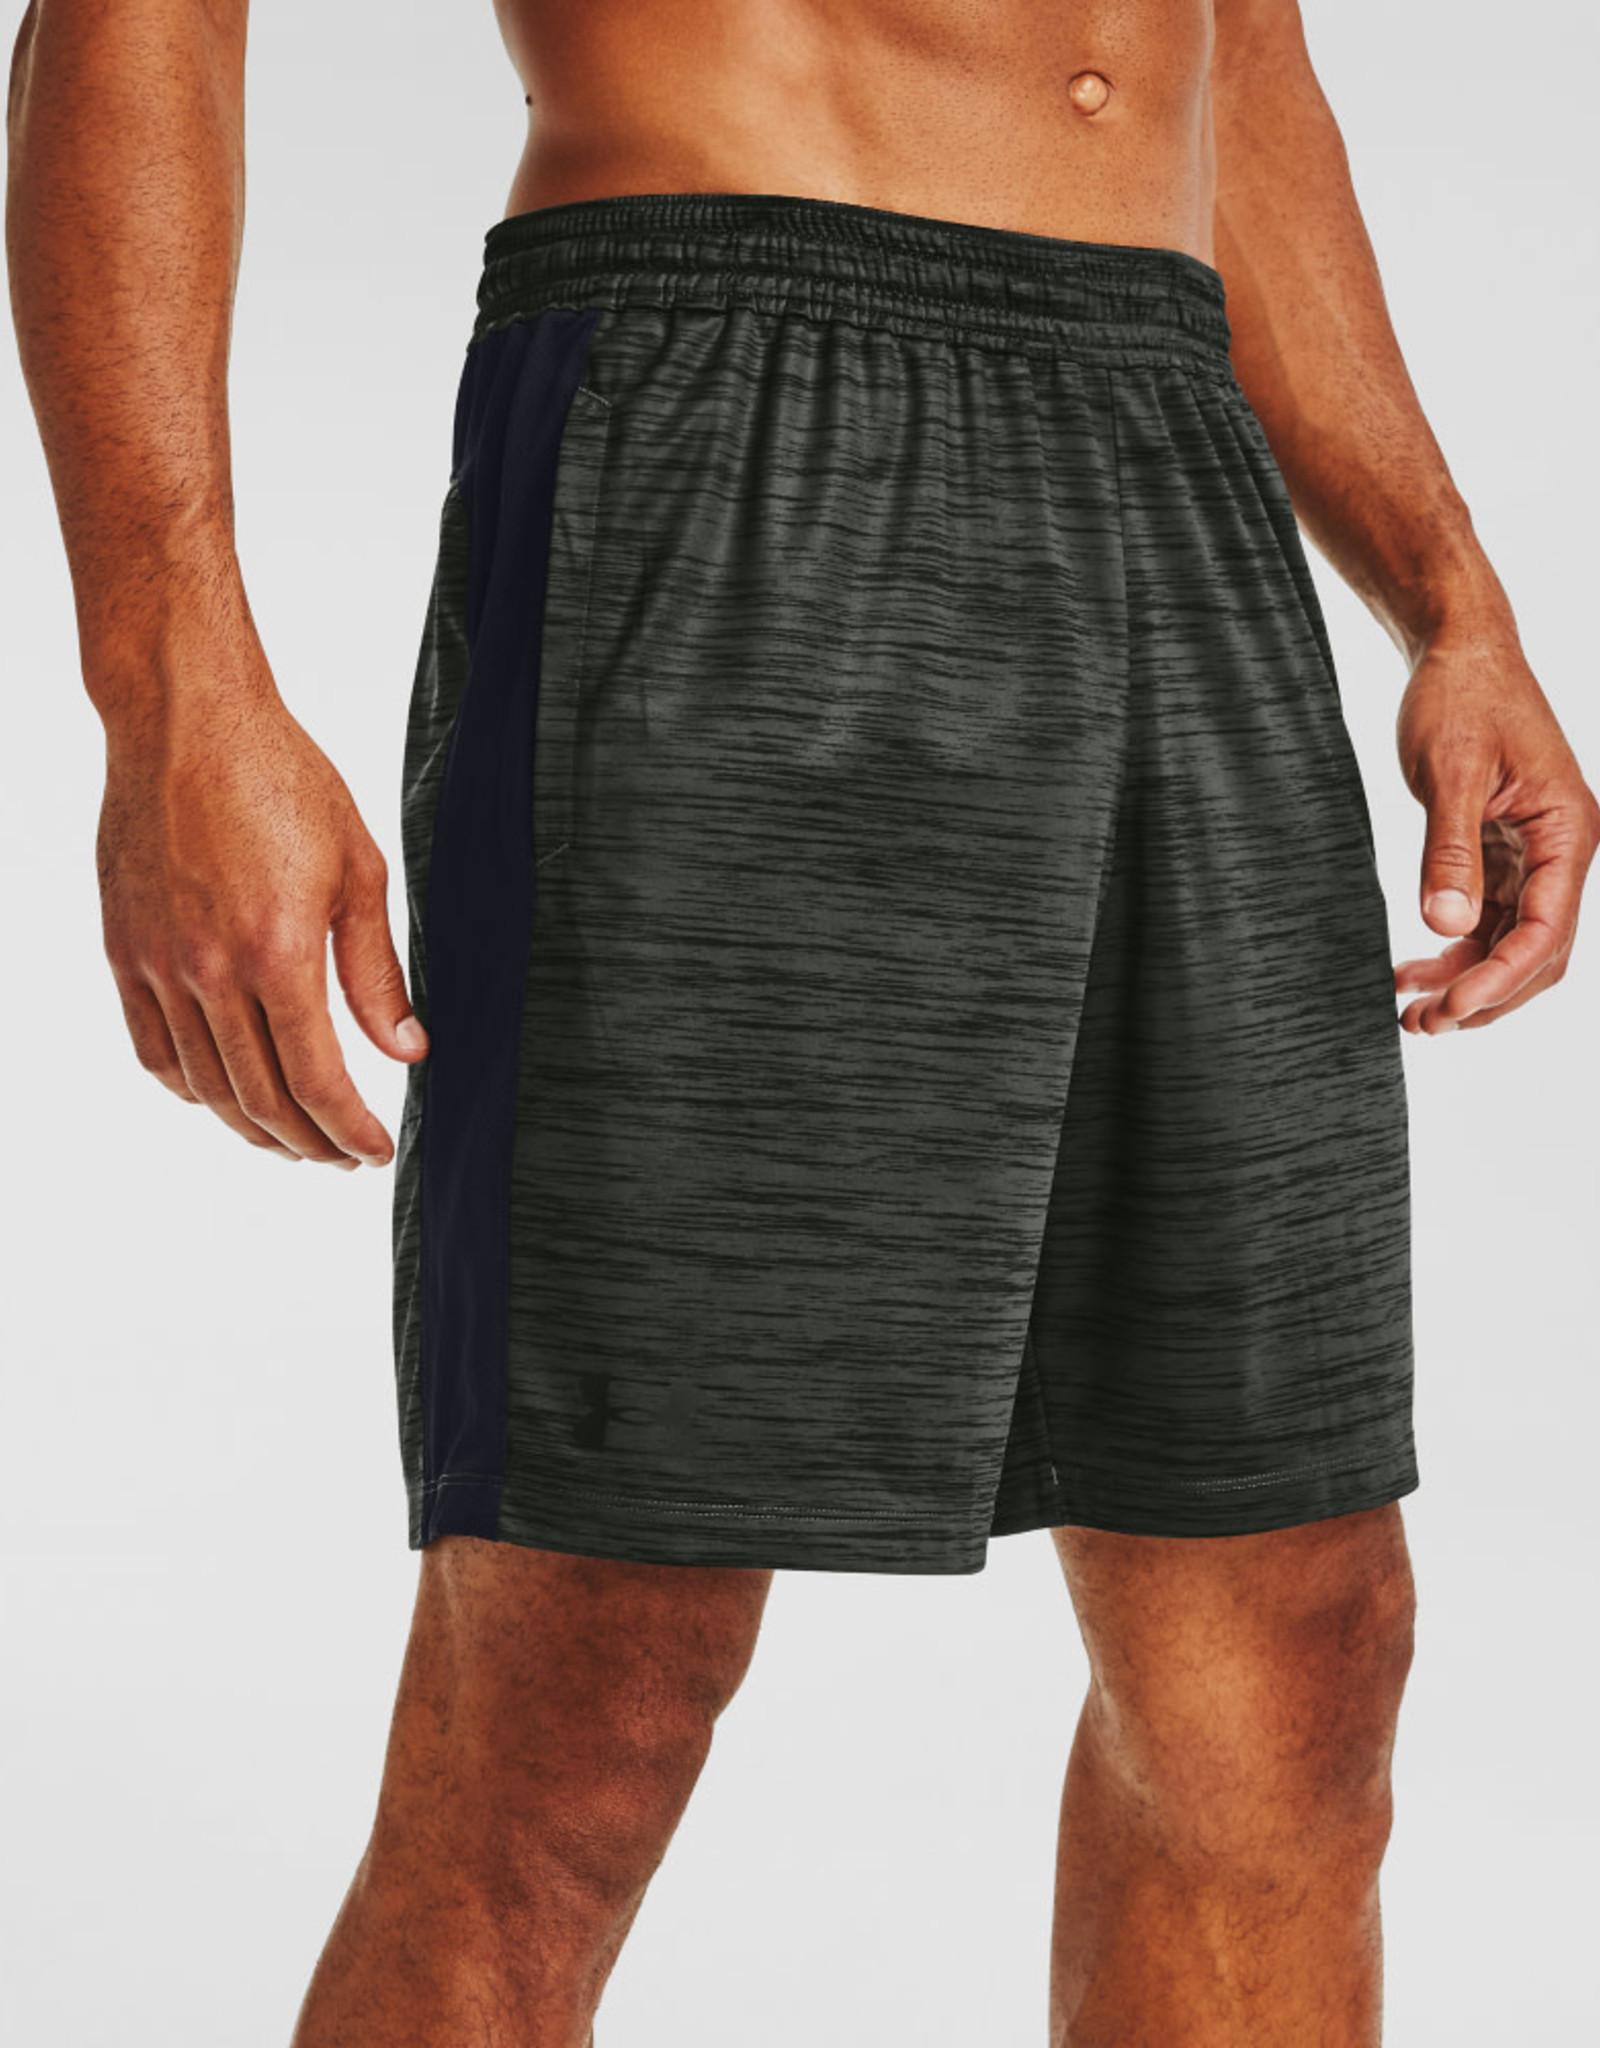 Under Armour UA MK-1 Twist Shorts - Baroque Green--Black